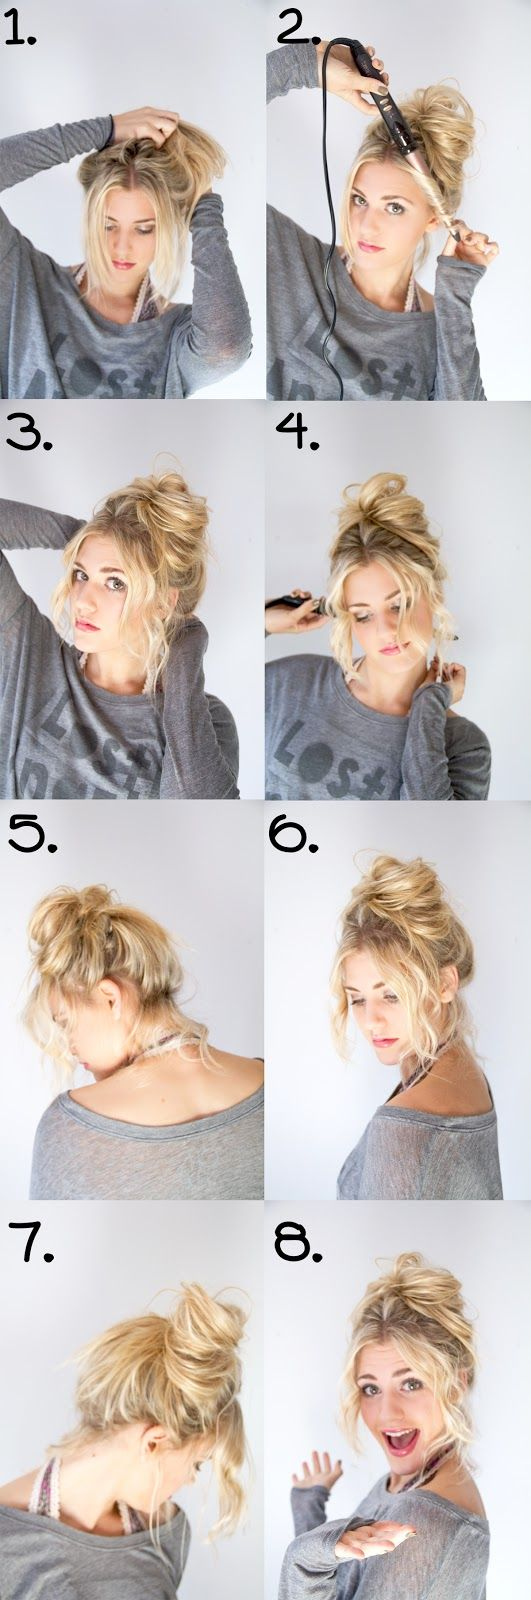 Hair tutorial messy bun fun hairstyle blonde hair pinterest